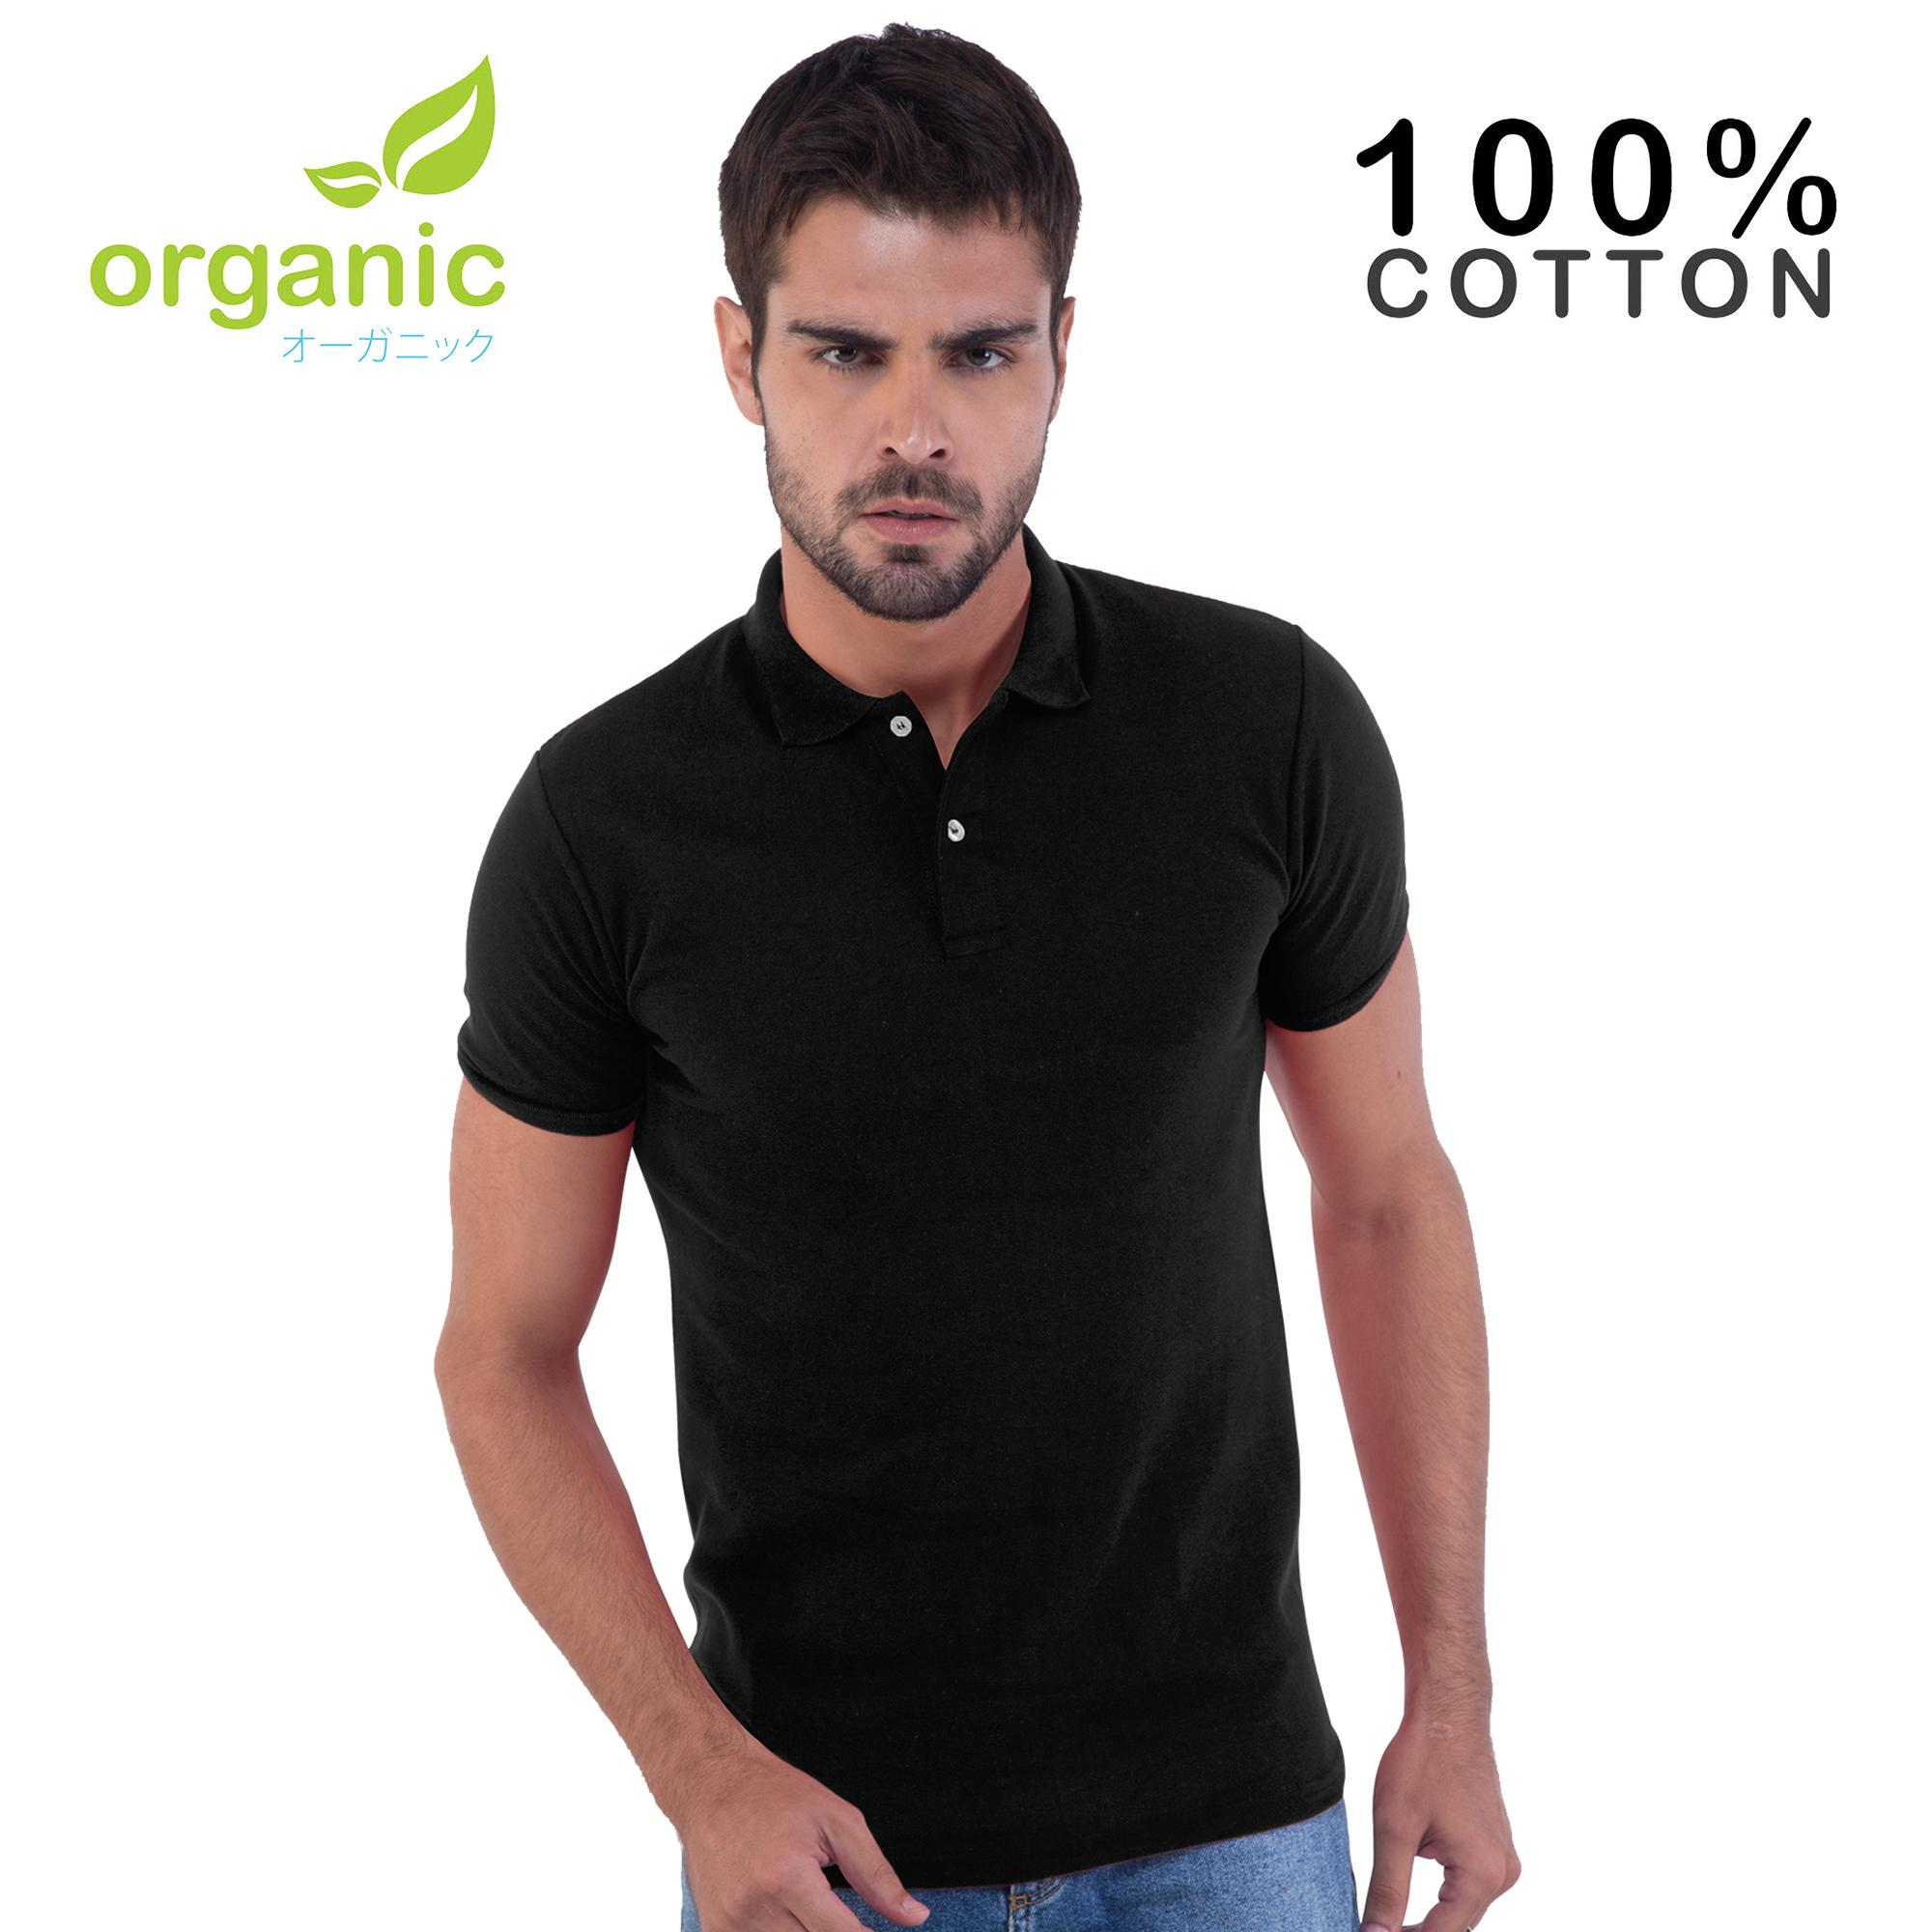 da67482f68e Polo for Men for sale - Mens Polo online brands